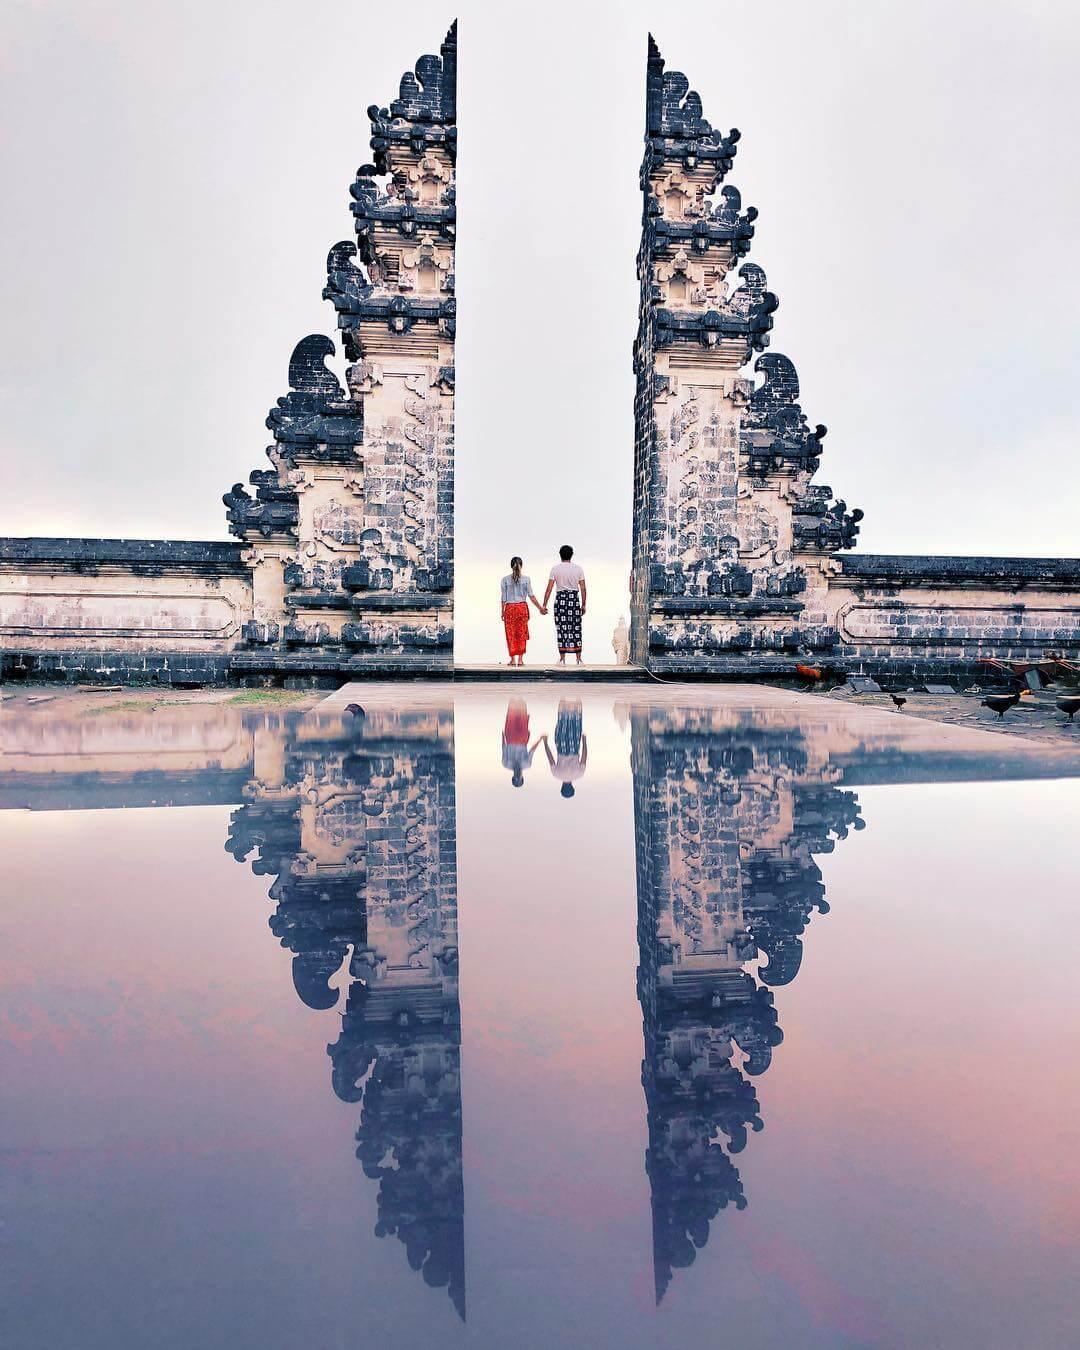 East Bali Instagram Tour